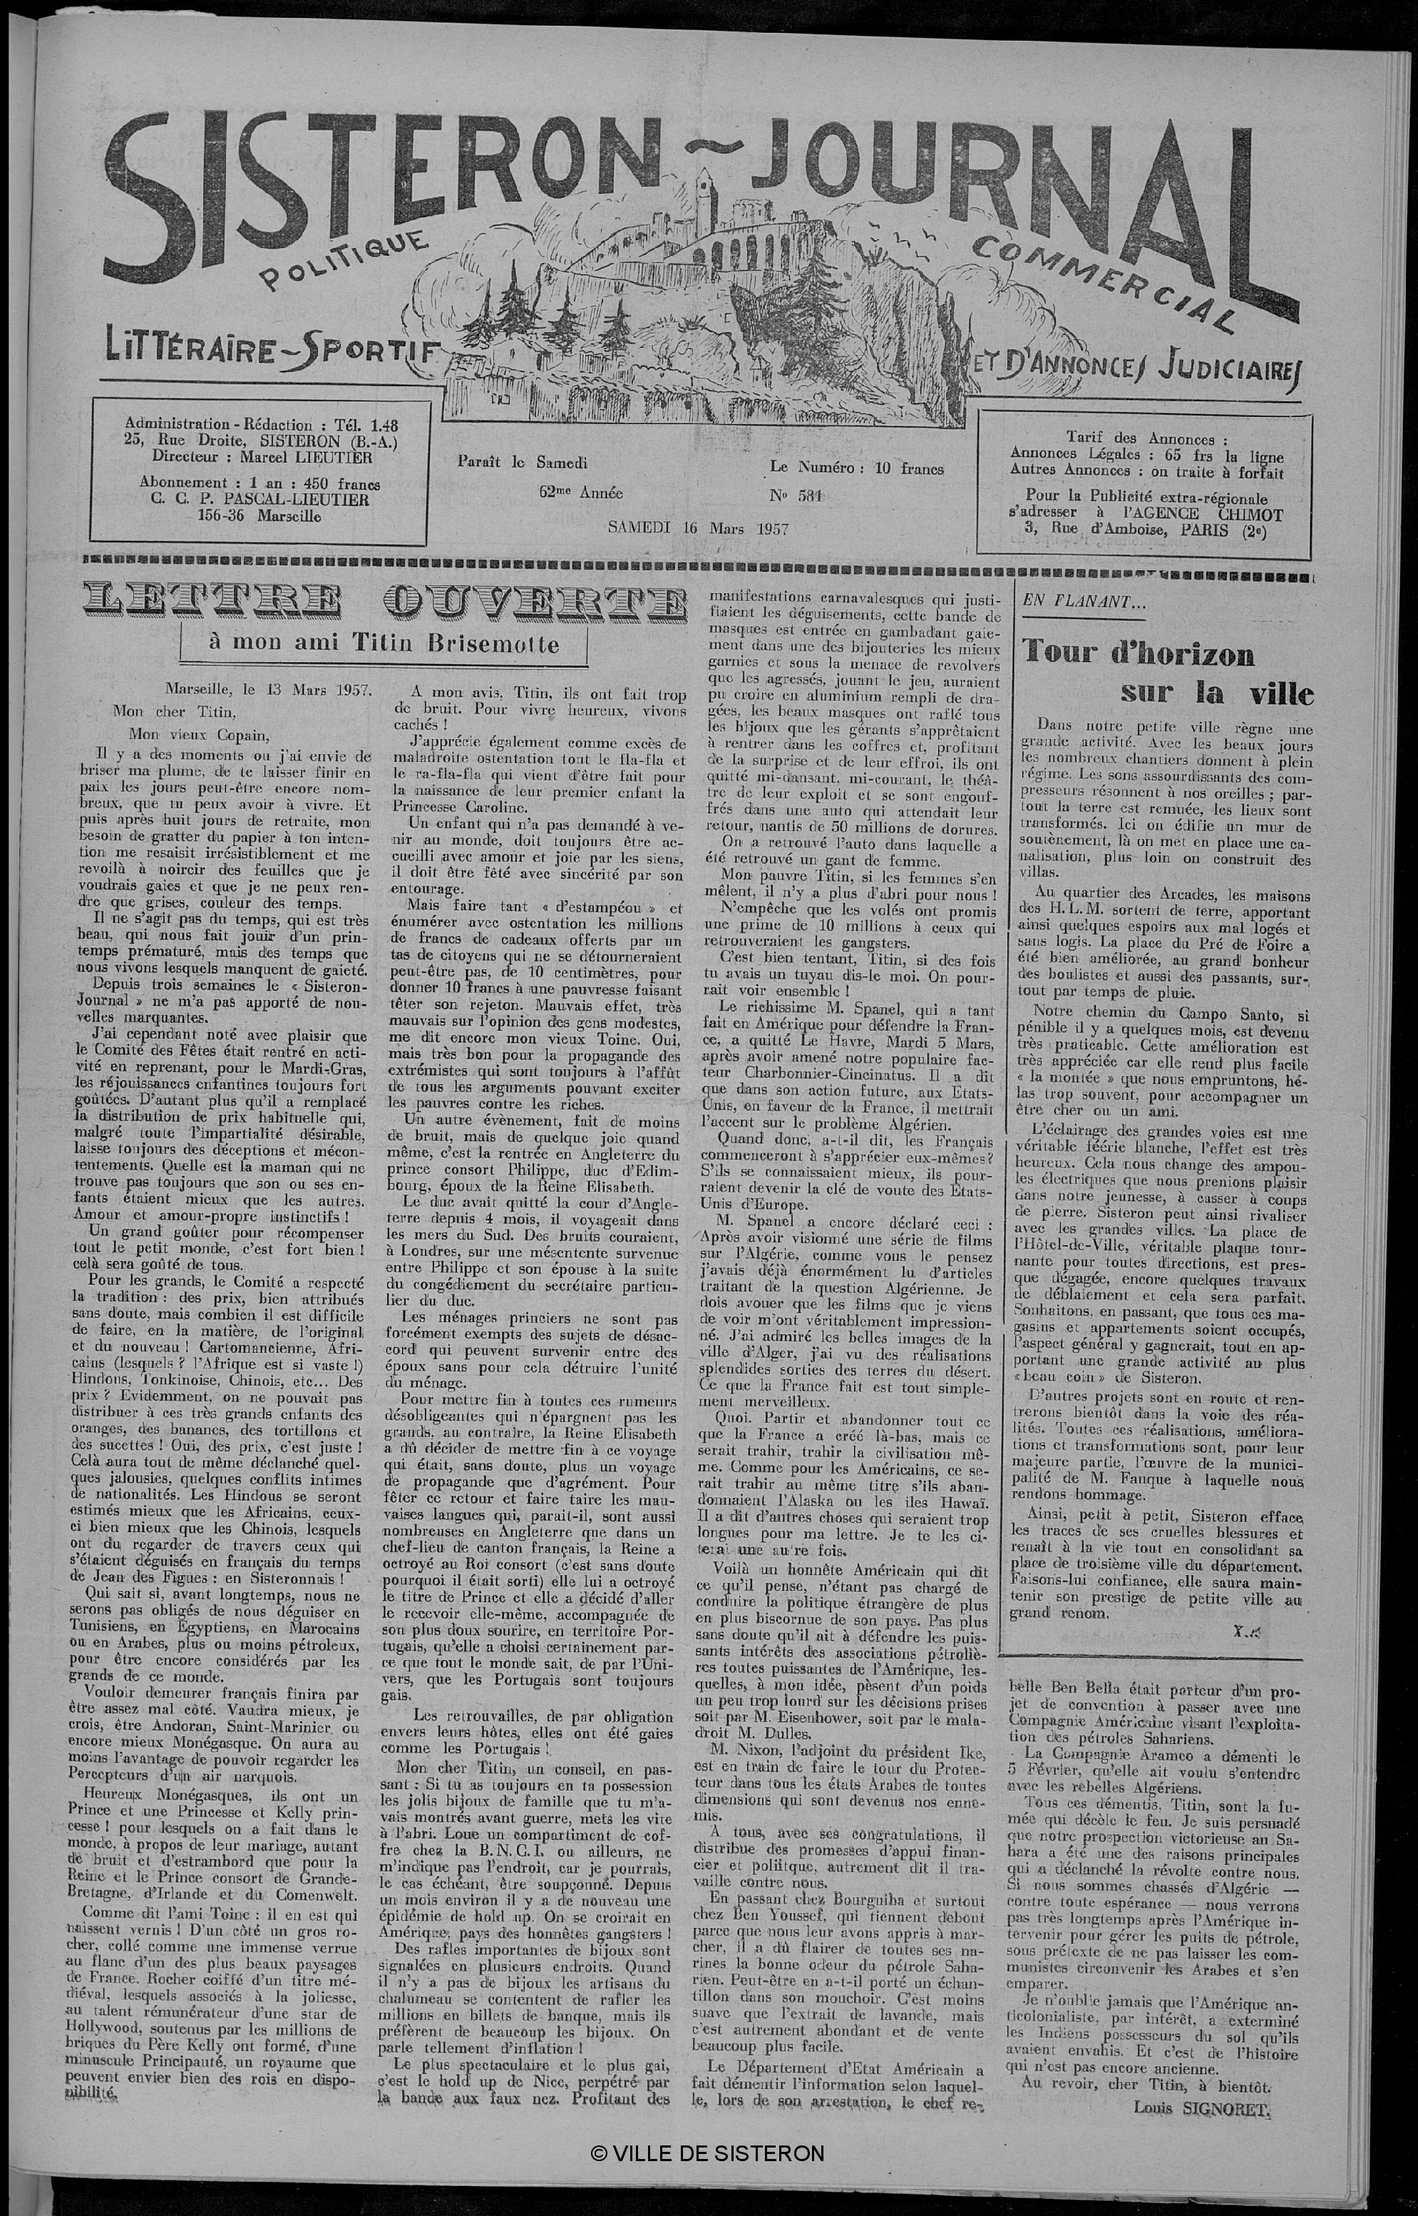 bcb8b7f71 Calaméo - Le Sisteron Journal du 16 03 1957